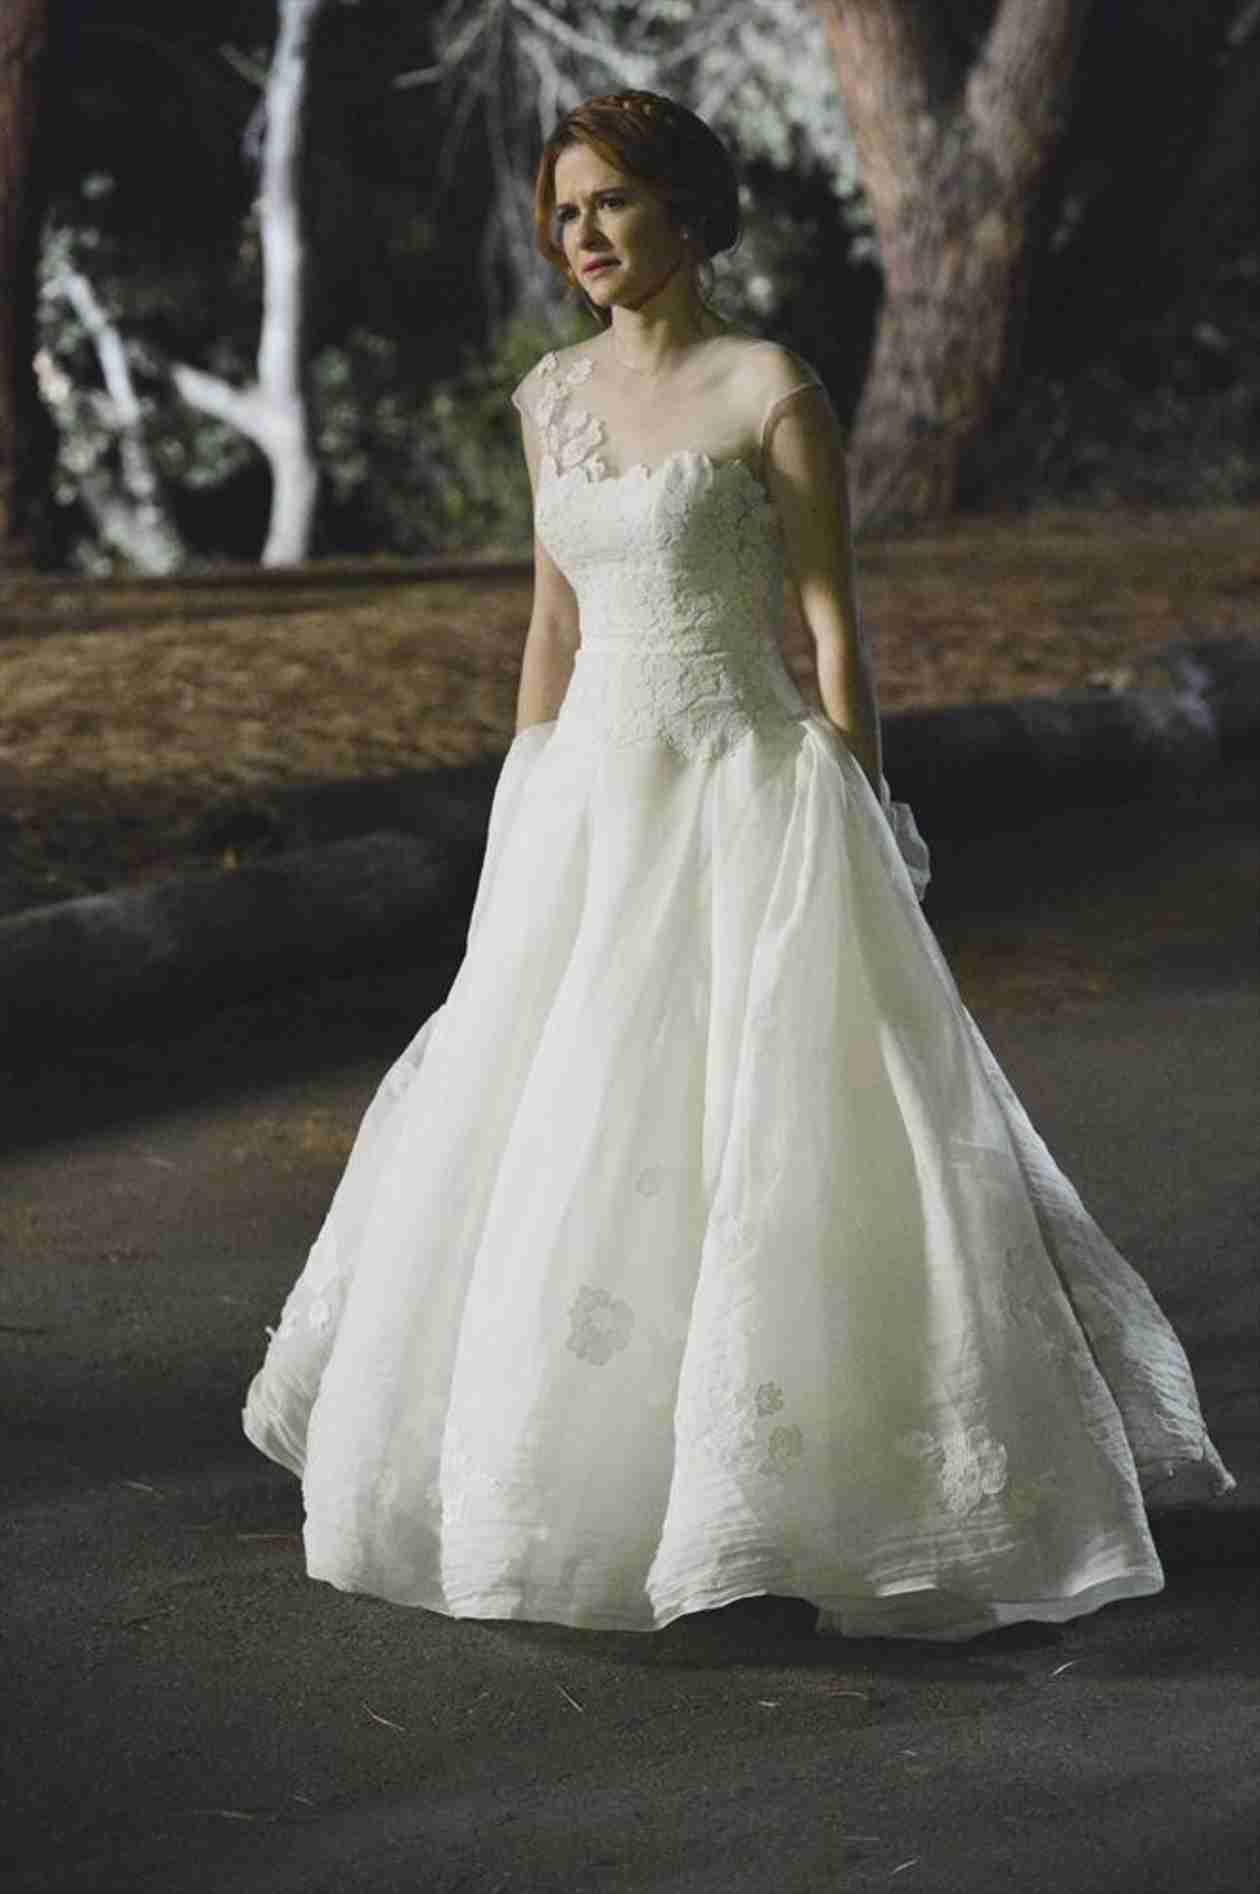 Grey 39 s anatomy the jackson and april wedding photo album for Bridesmaid dresses for april wedding